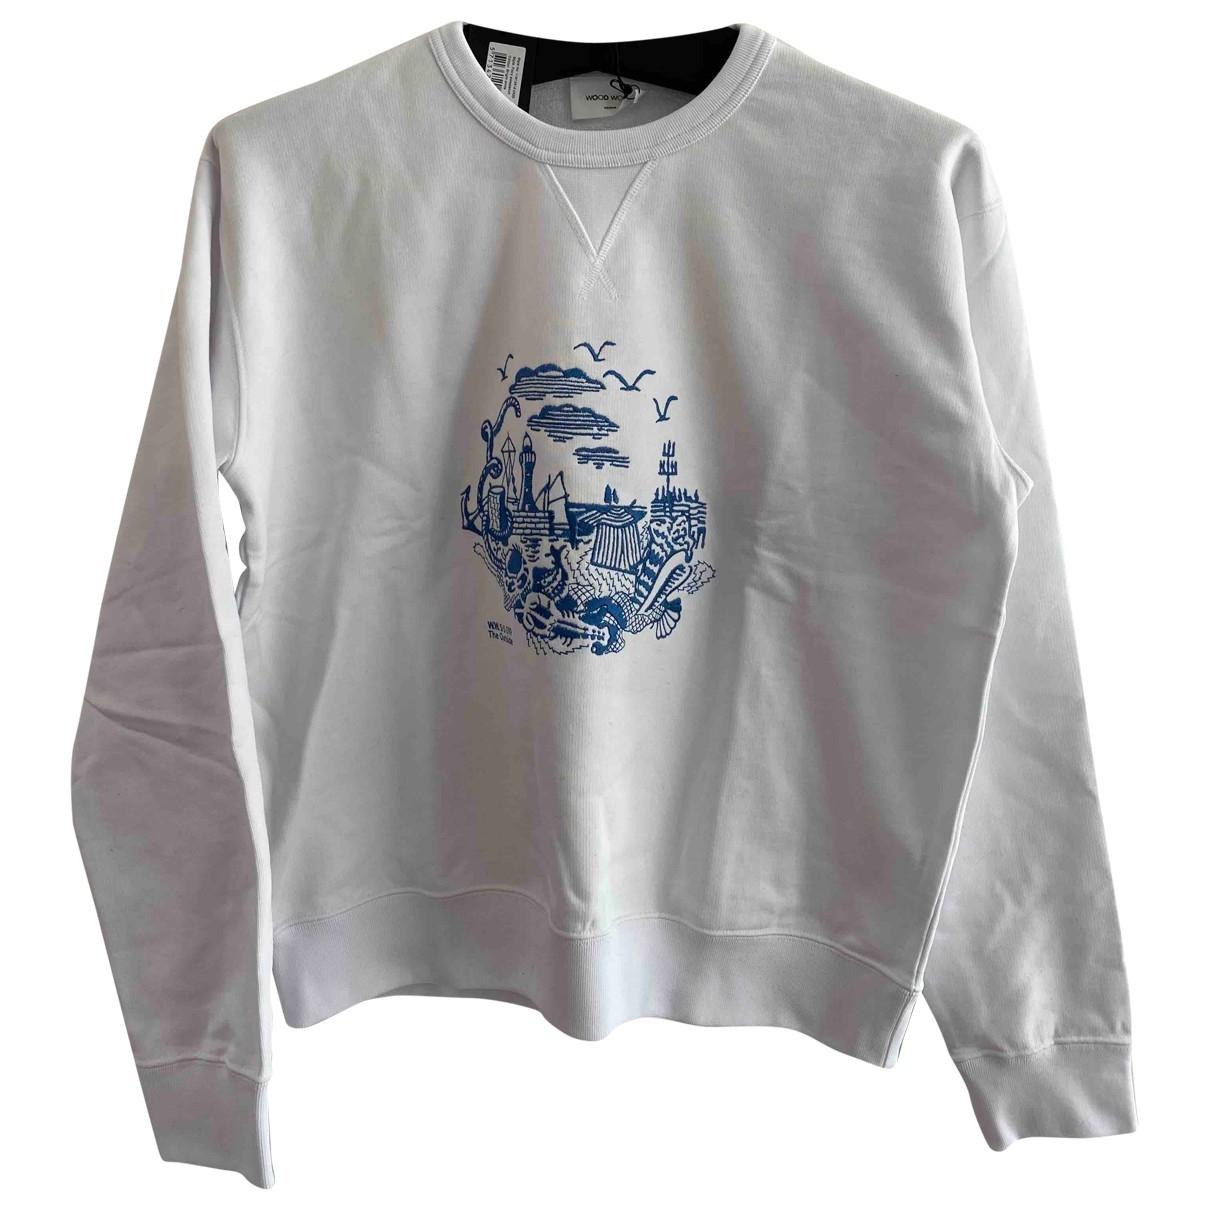 Wood Wood \N White Cotton Knitwear & Sweatshirts for Men M International